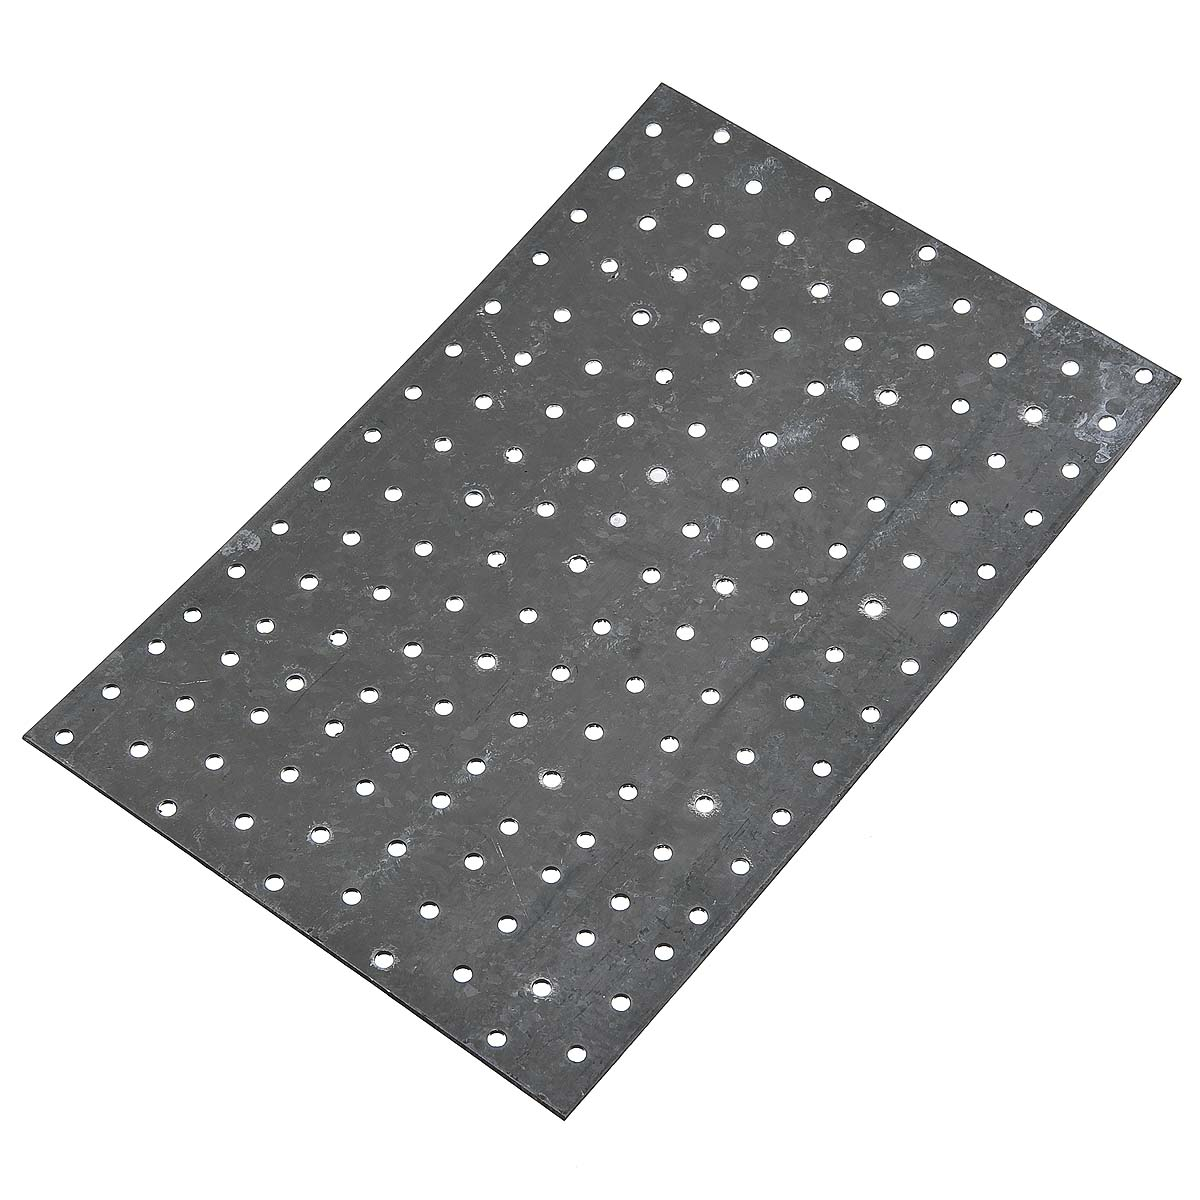 Пластина соединительная оцинкованная 300х200х2 мм